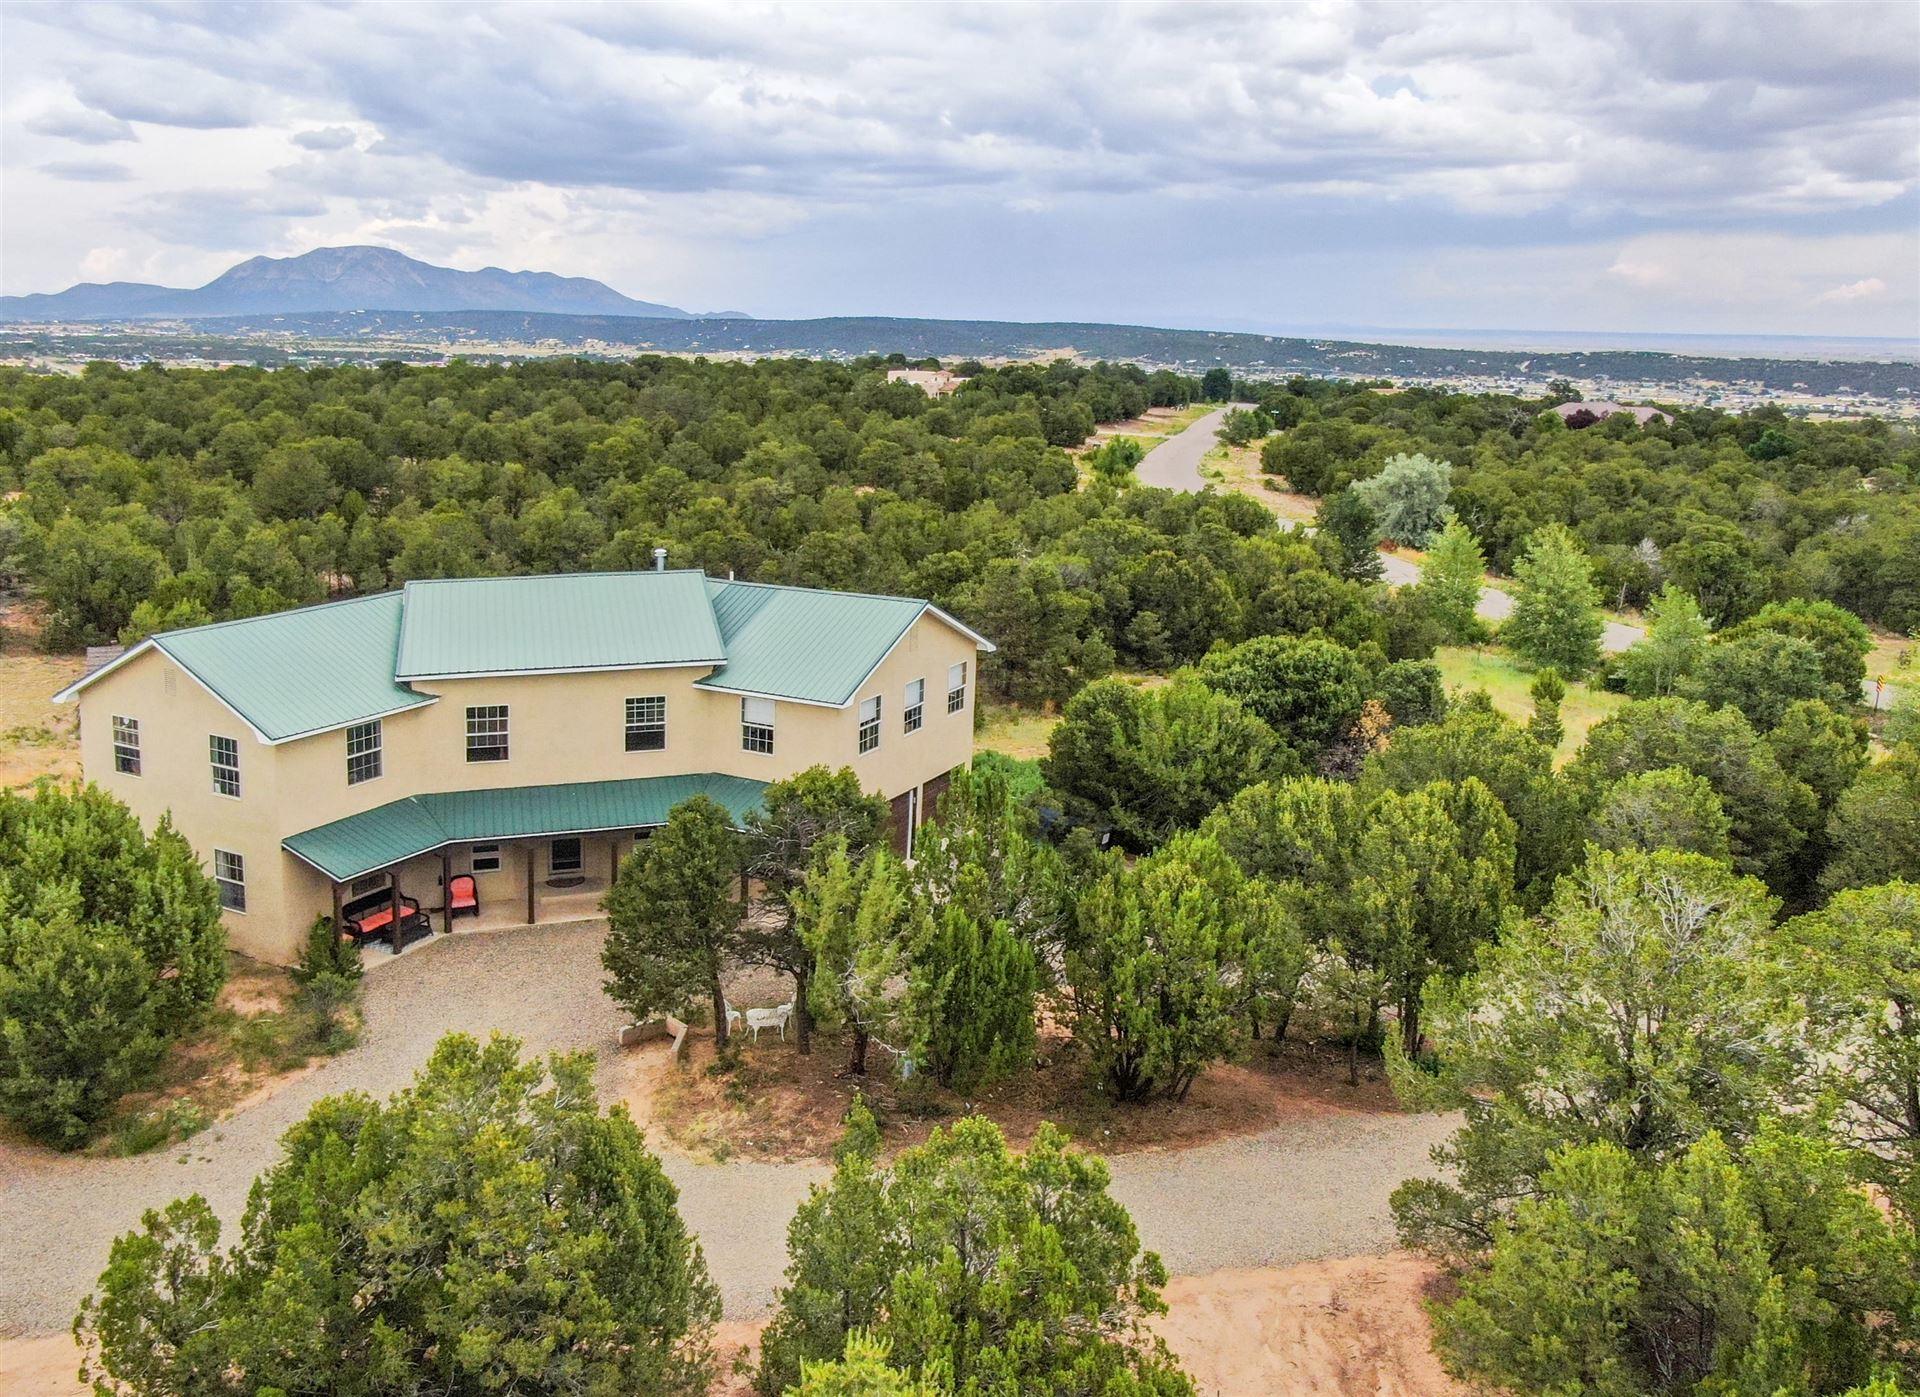 Photo for 22 Sandia Mountain Ranch Drive, Tijeras, NM 87059 (MLS # 989265)